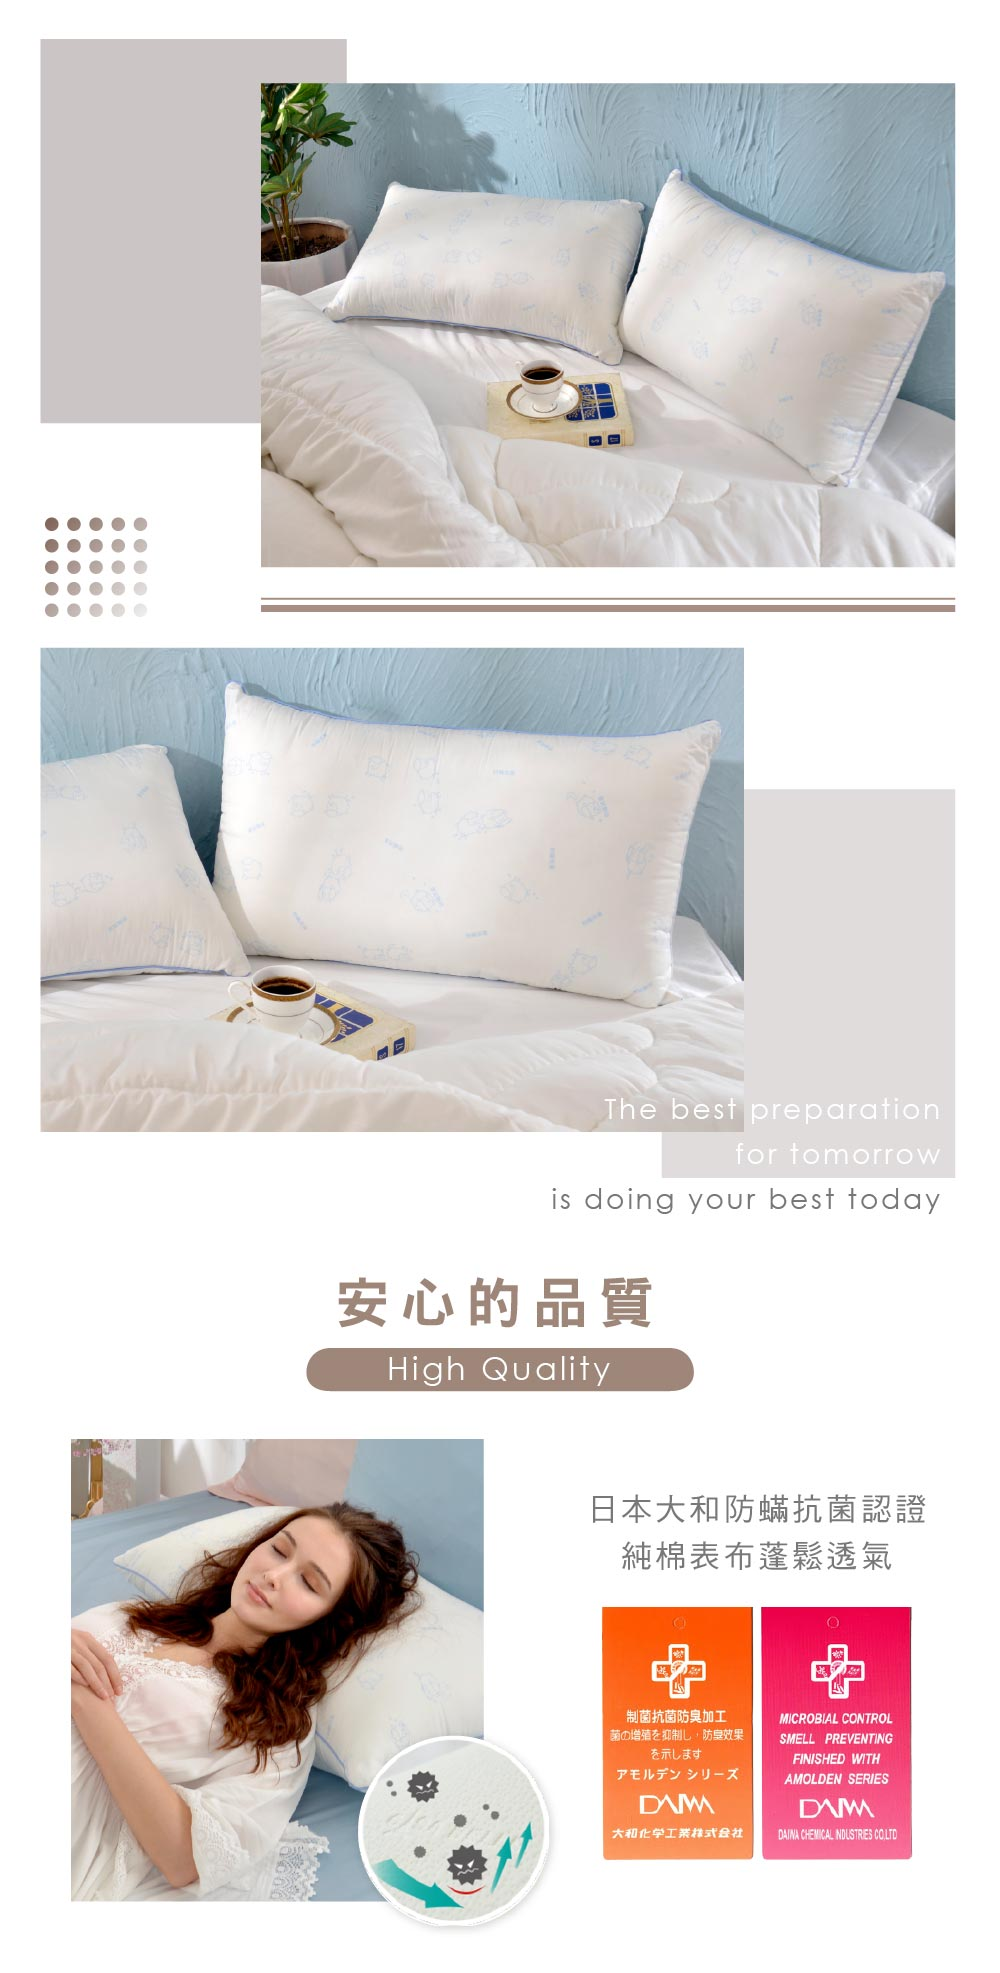 記憶枕,Labelle